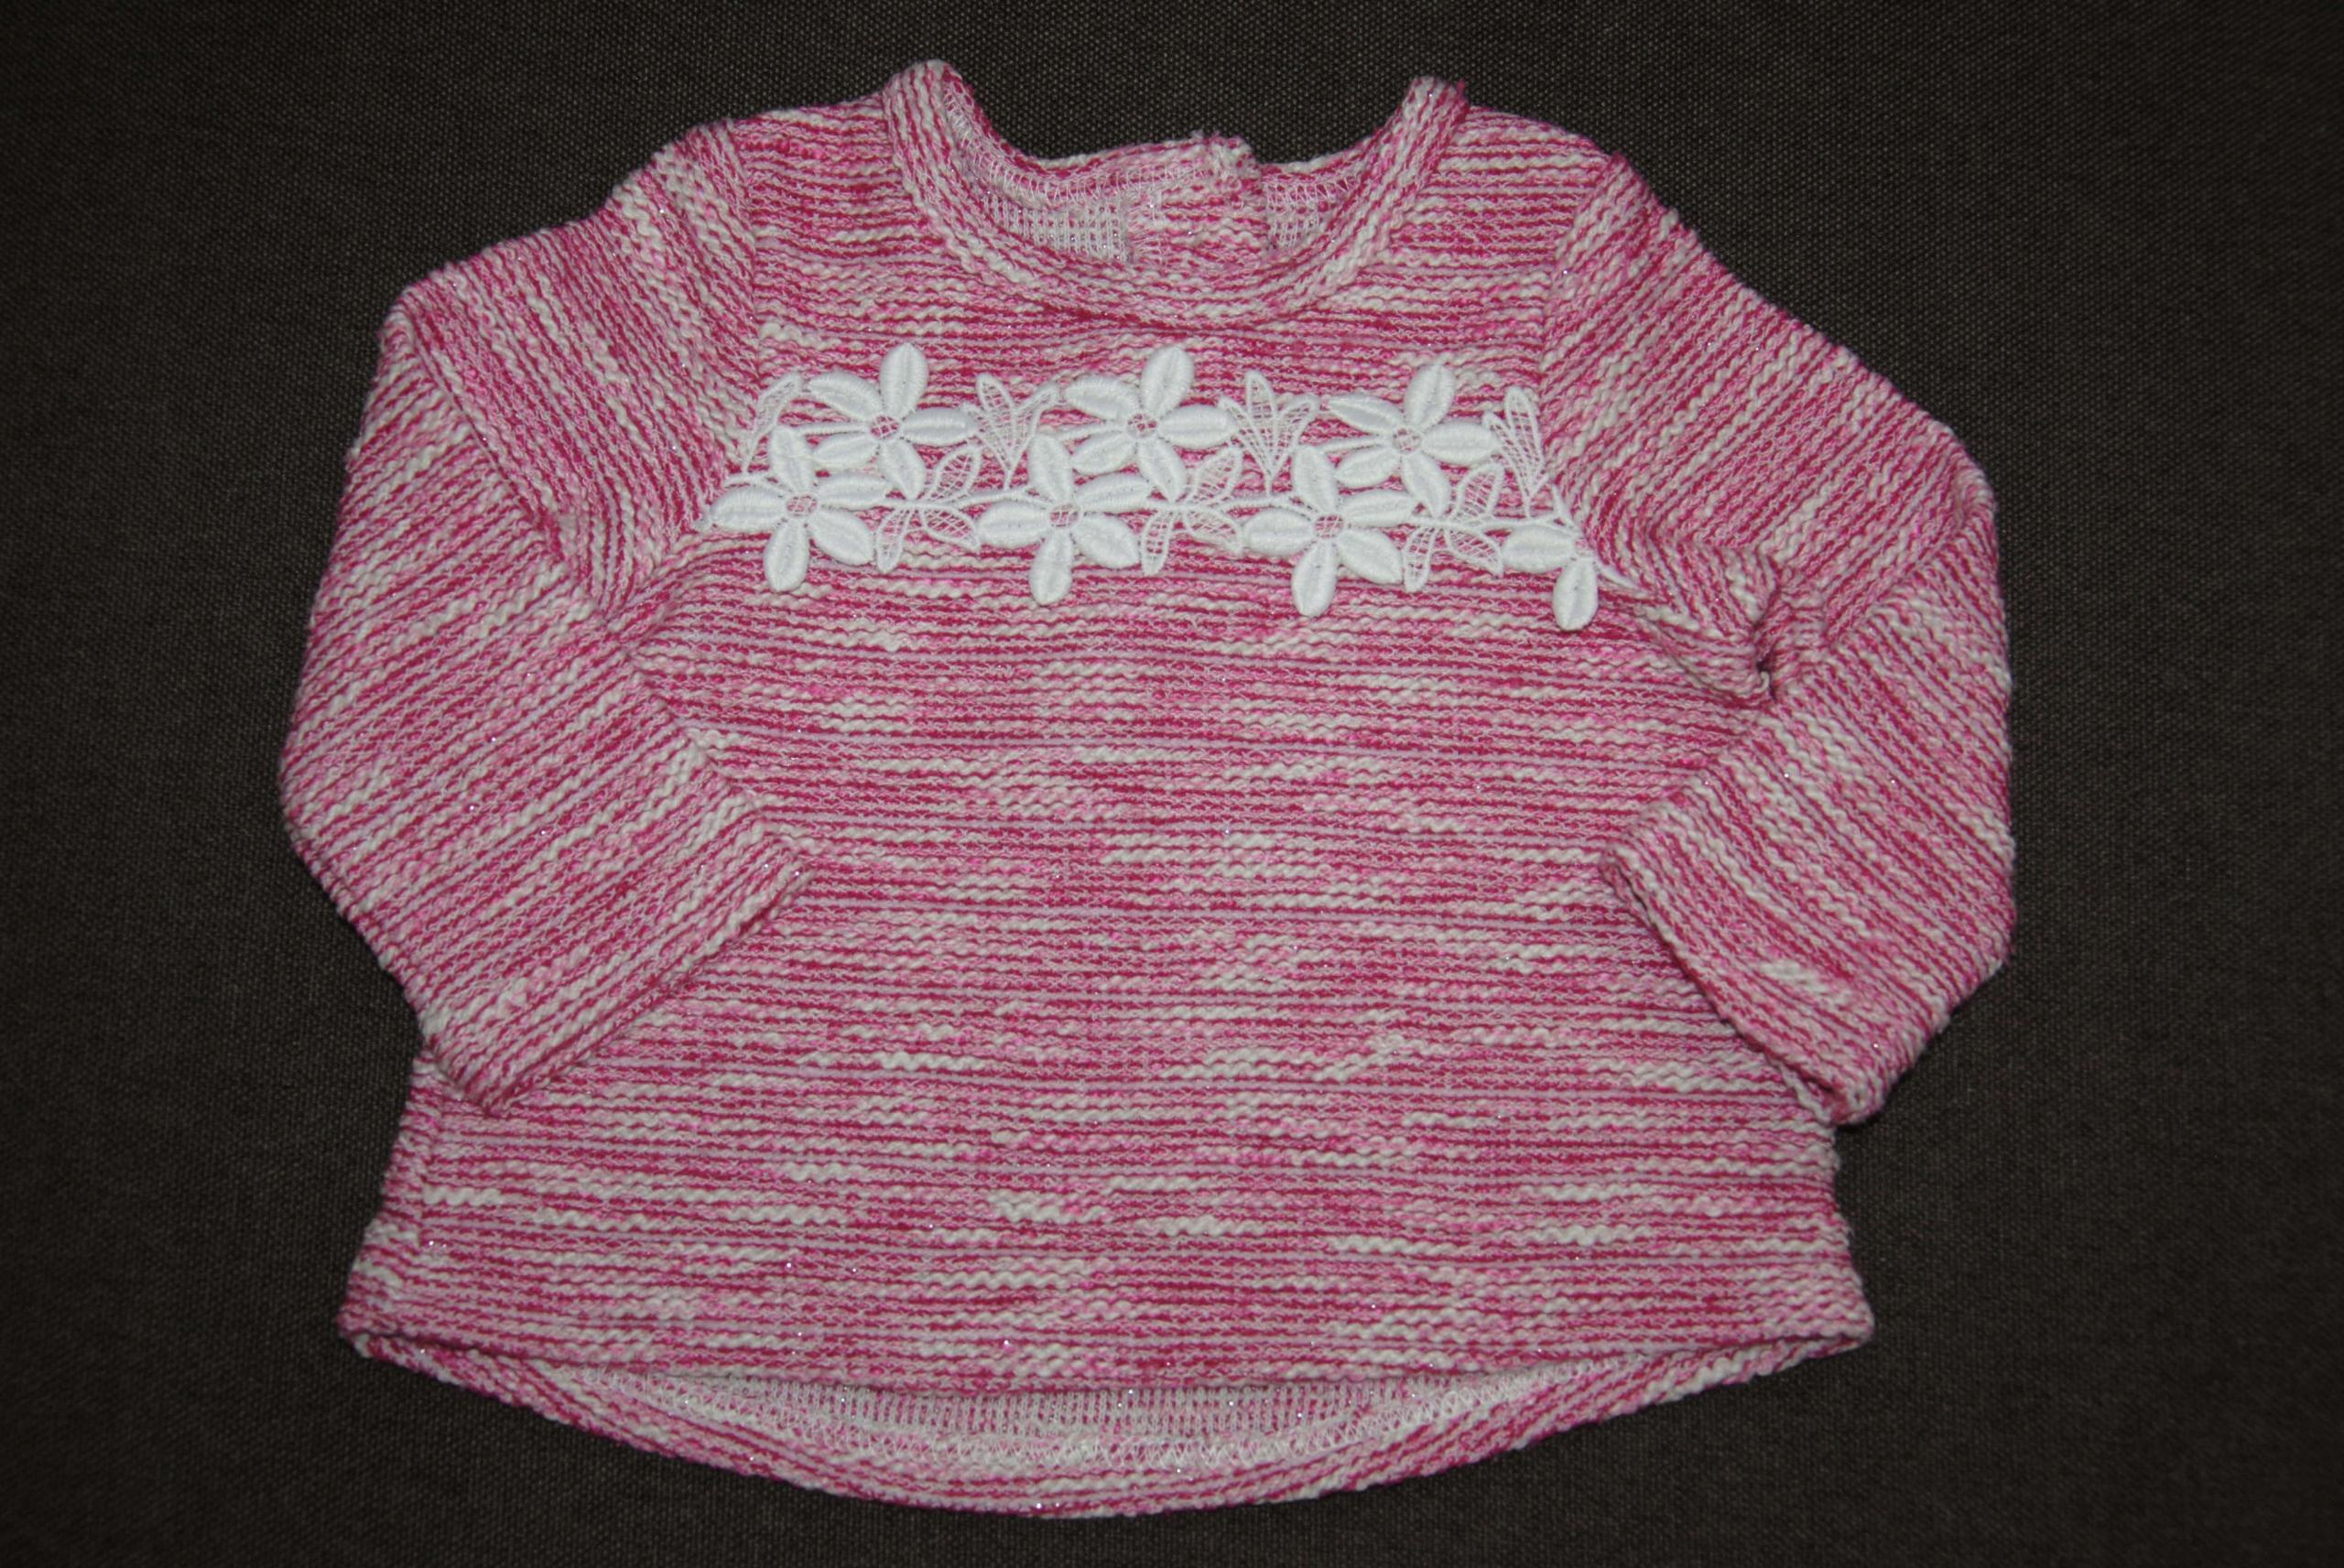 Early Days bluza- sweterek koronka duże 68 małe 74